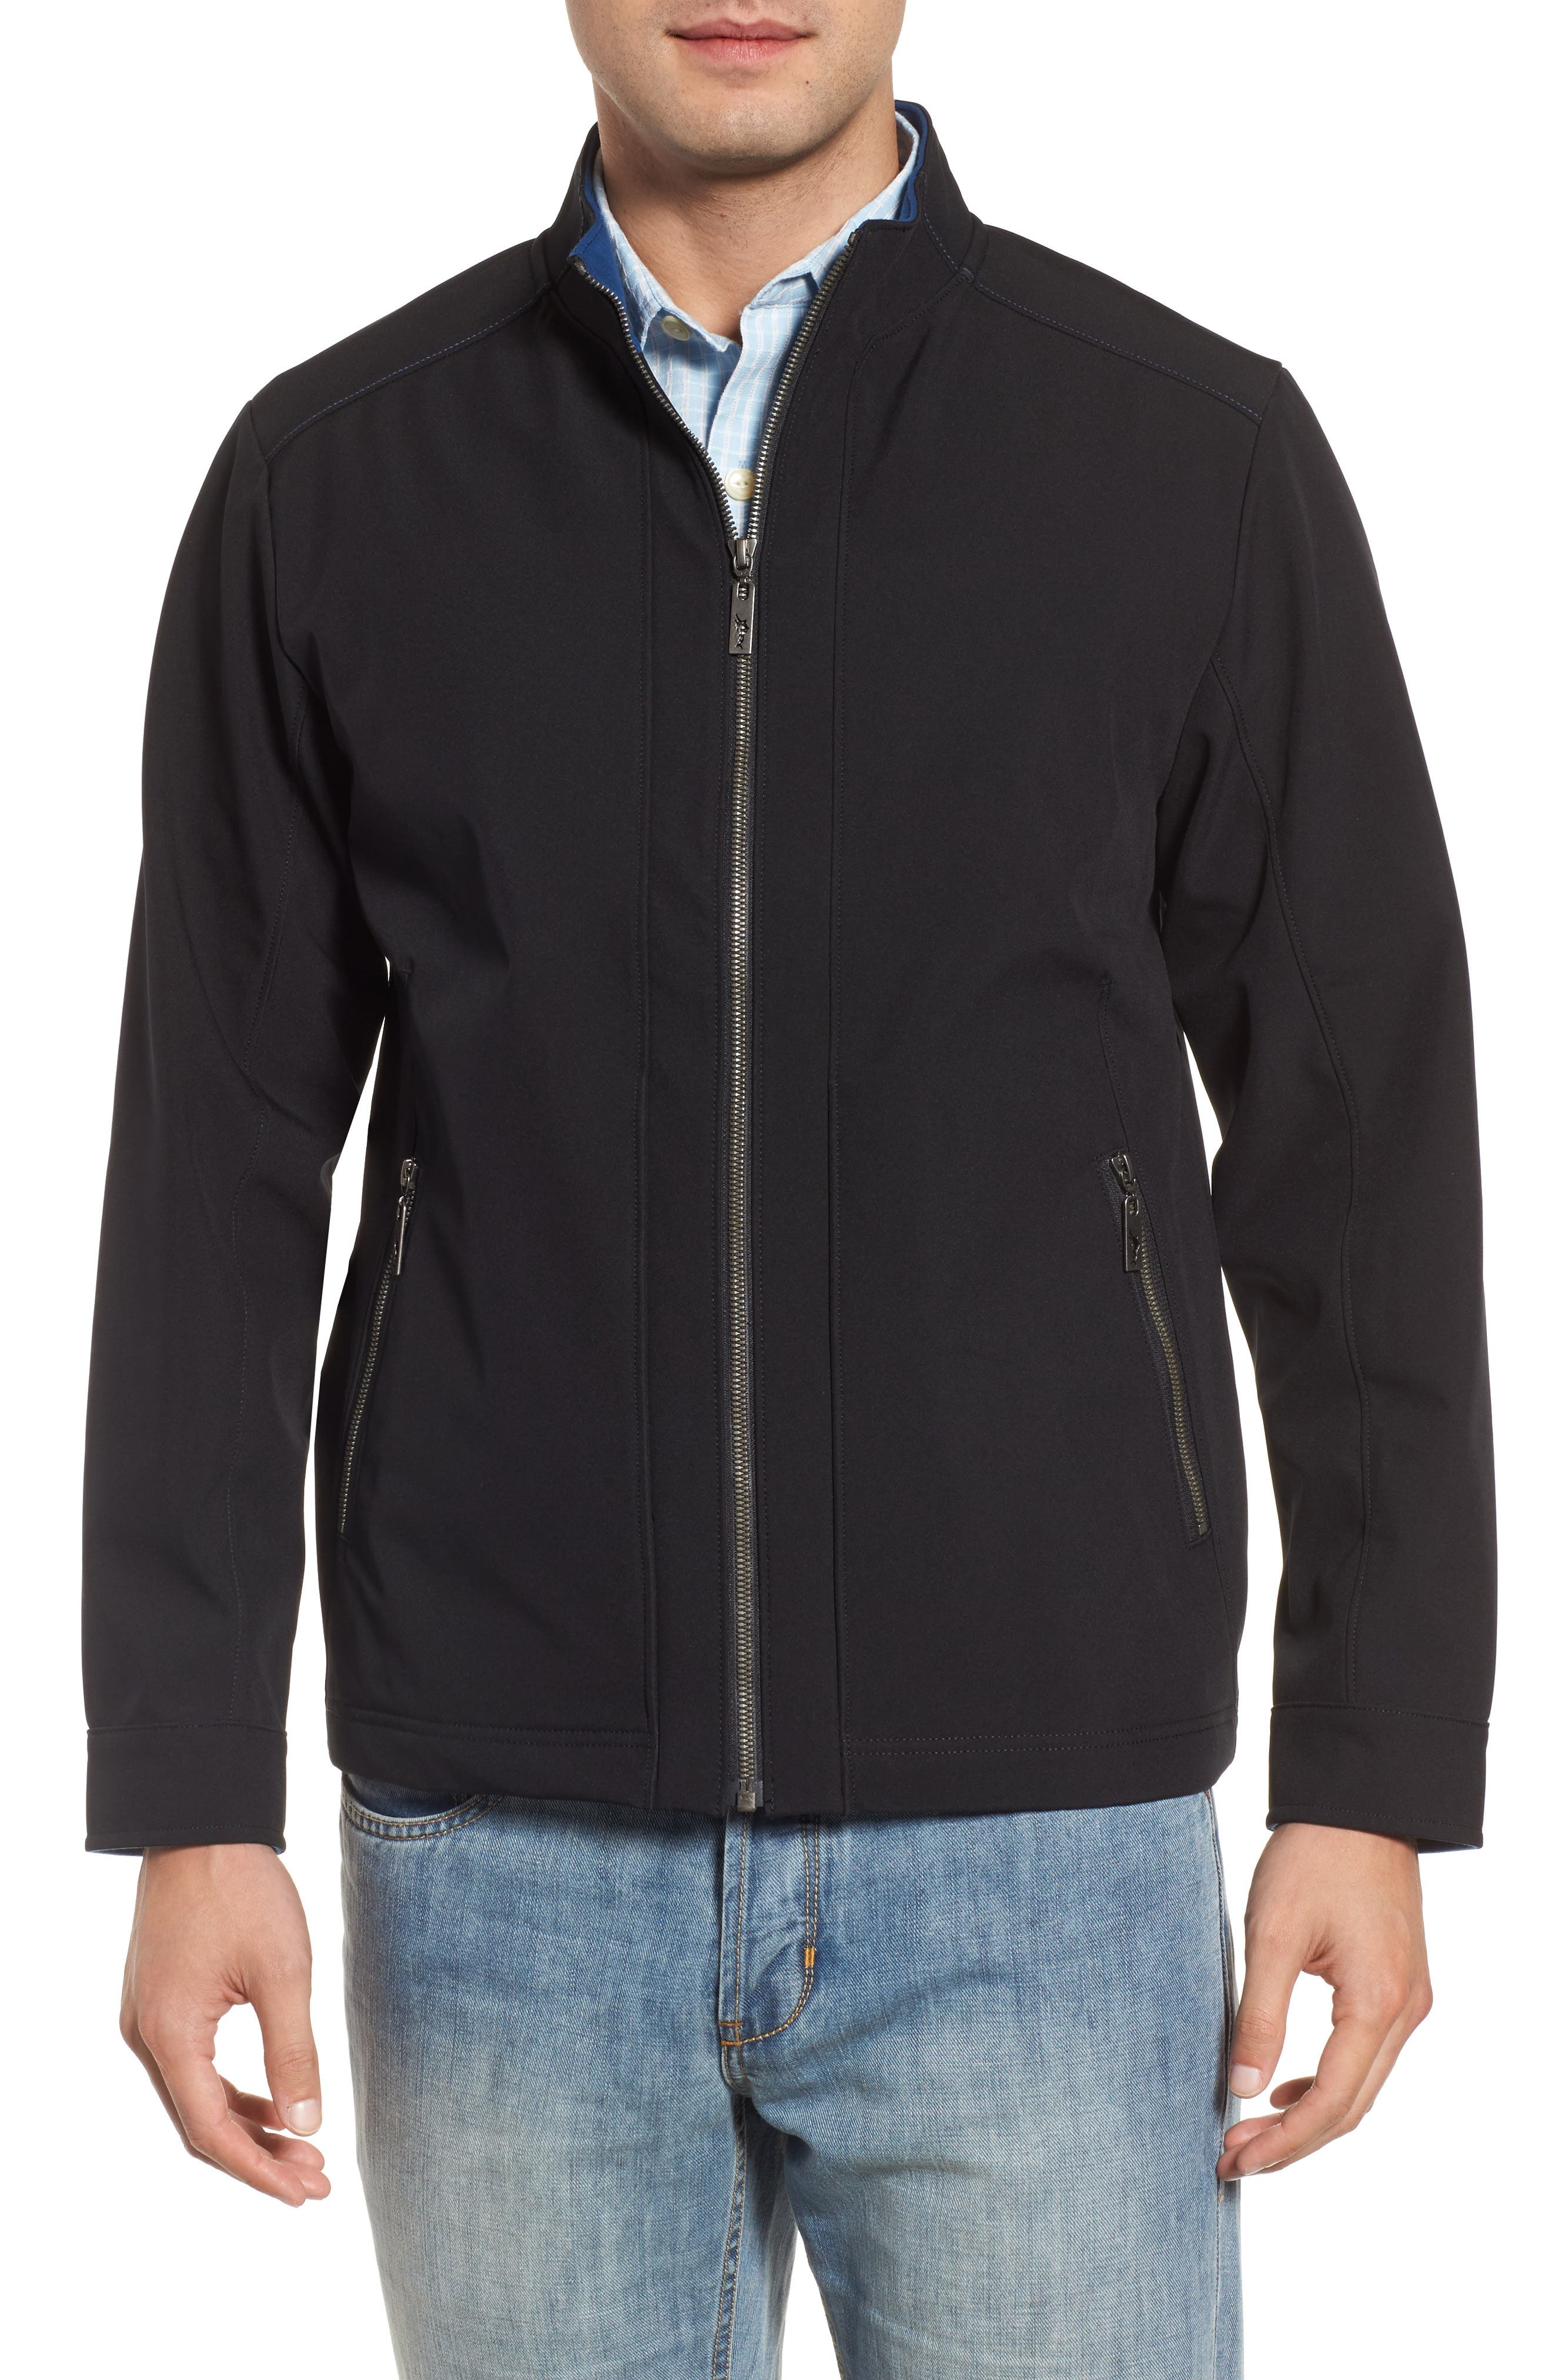 Downswing Zip Jacket,                             Alternate thumbnail 4, color,                             001